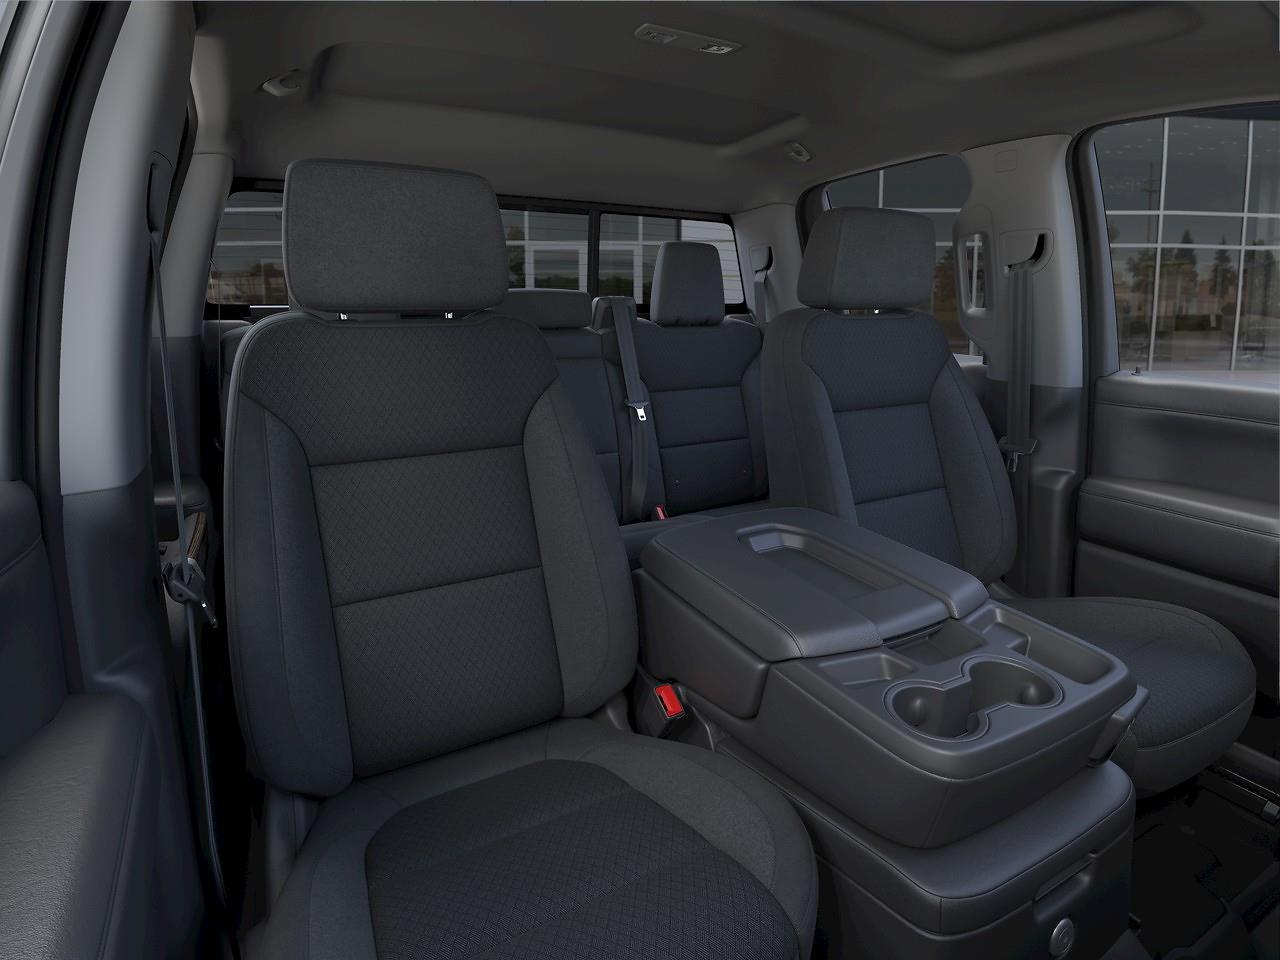 2021 GMC Sierra 1500 Double Cab 4x4, Pickup #Q10227 - photo 32